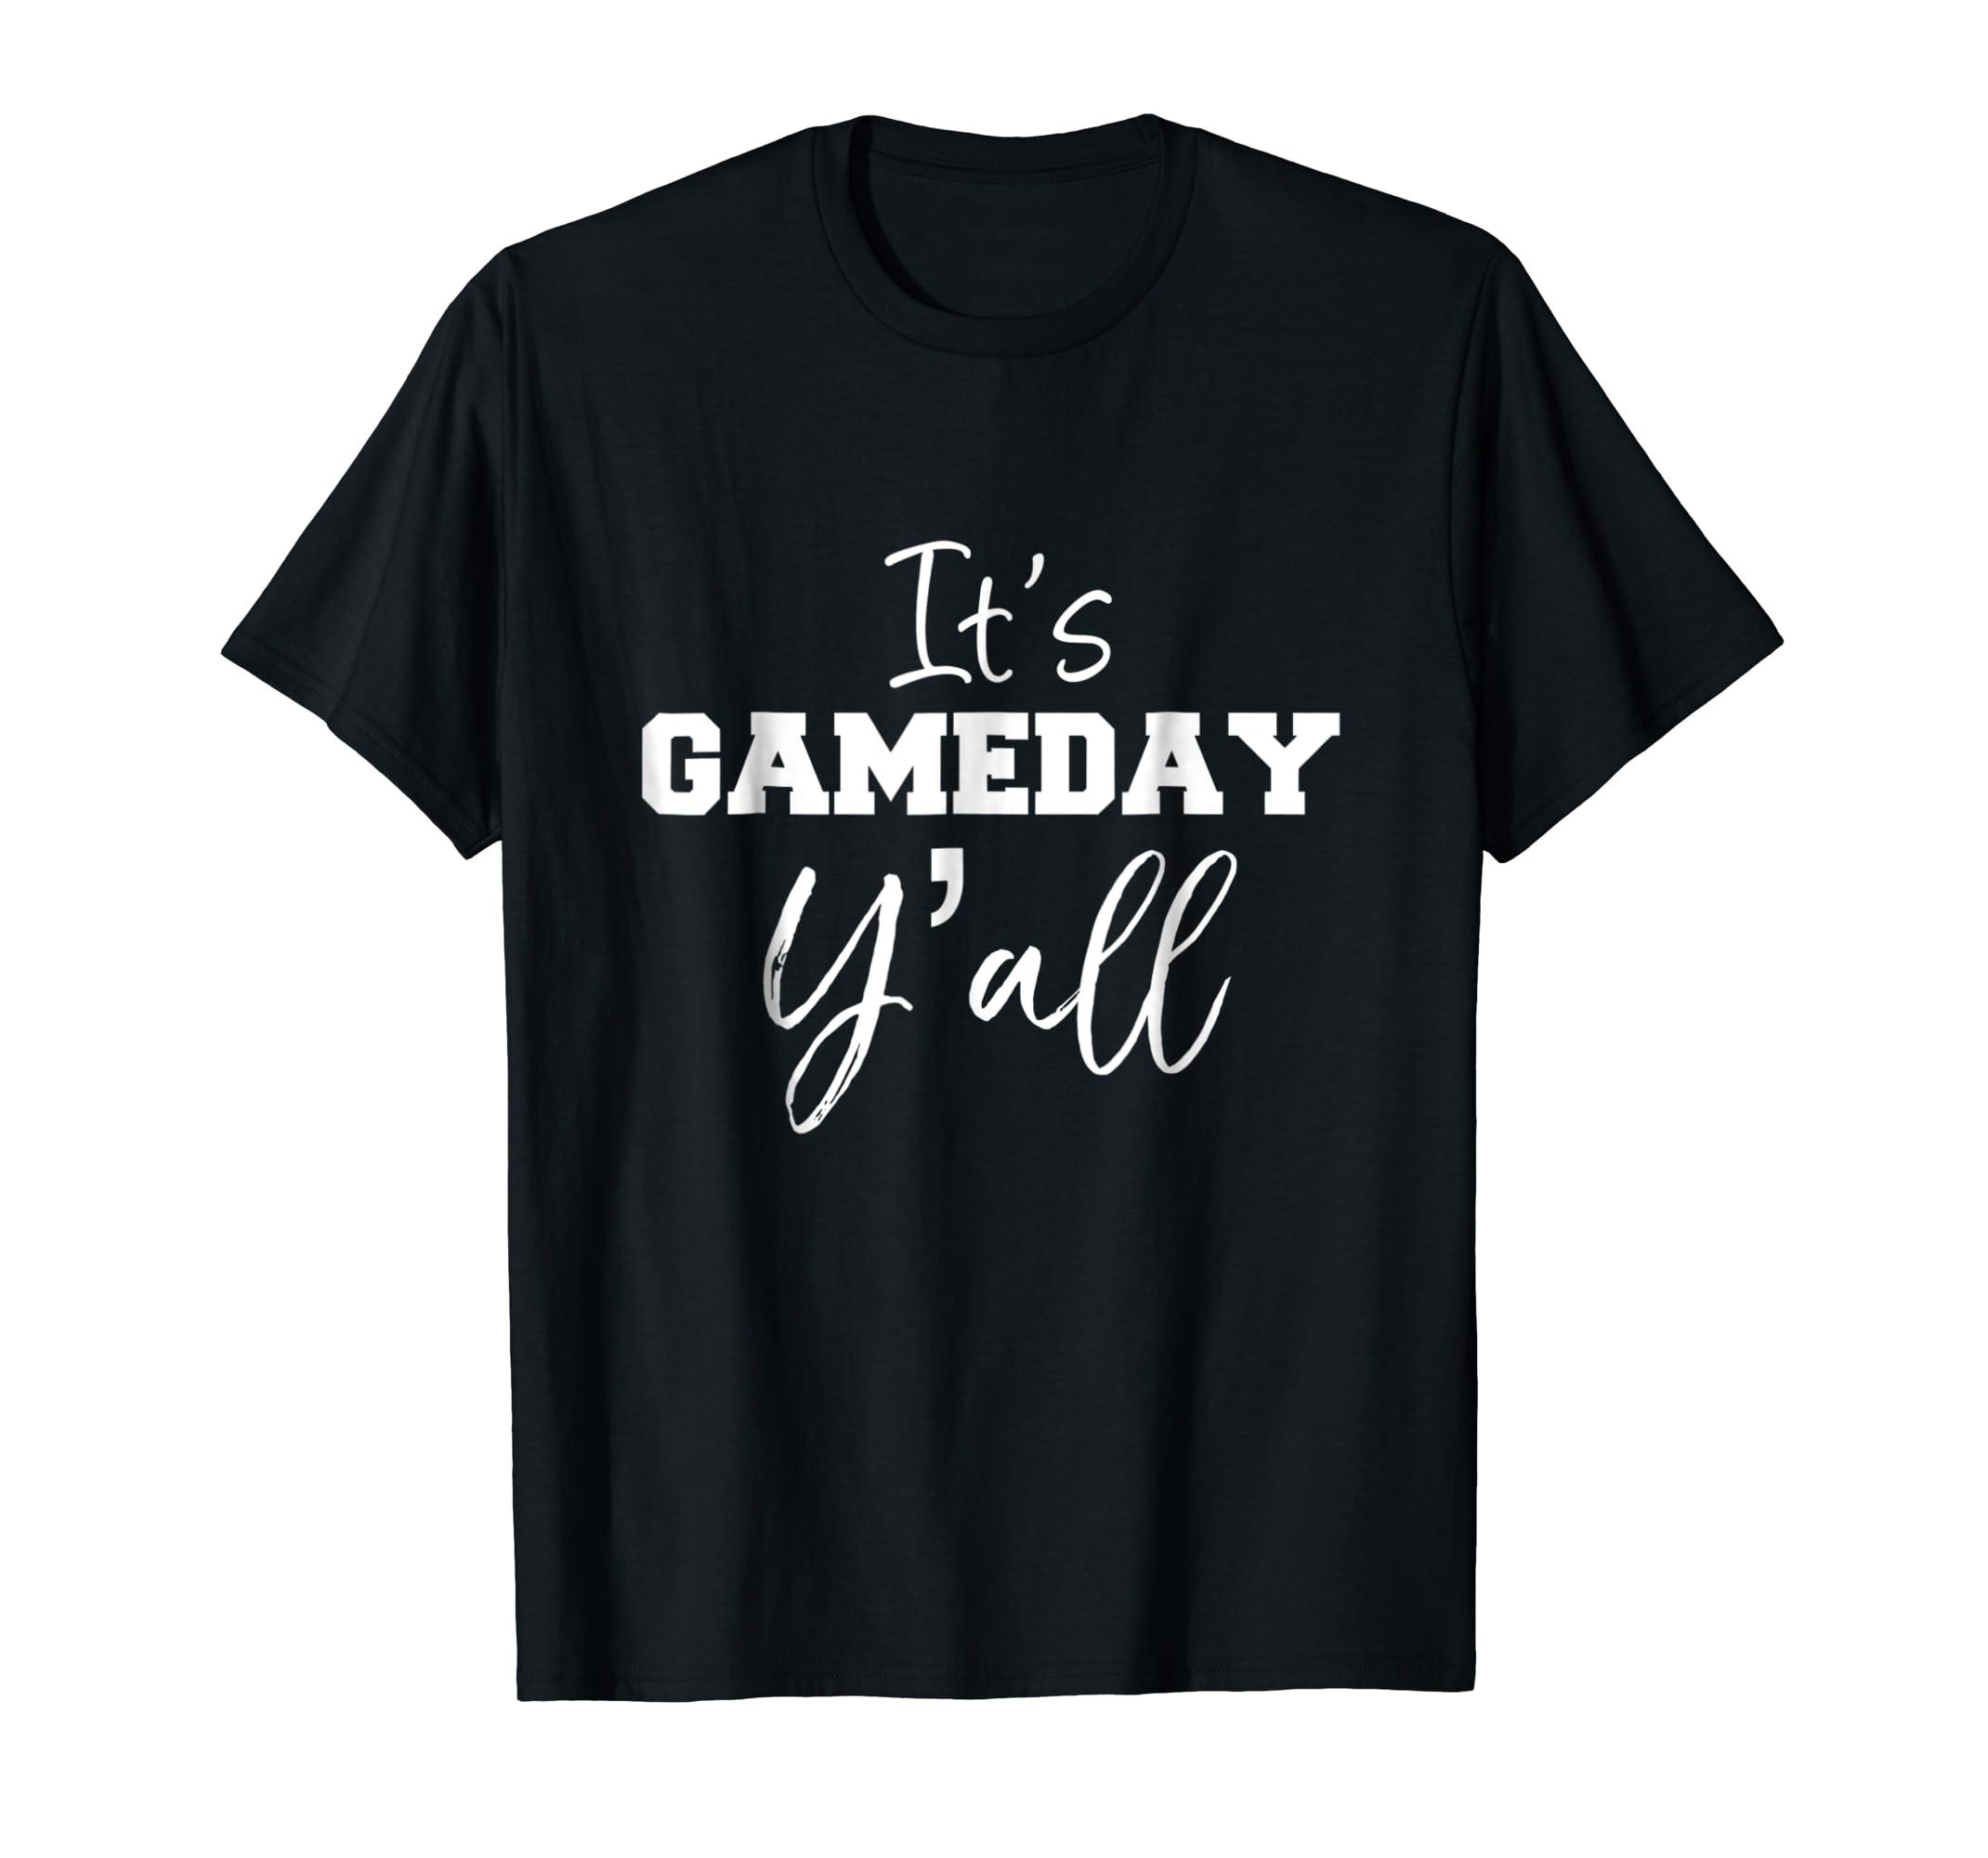 b262a439 Amazon.com: It's Game Day Y'all Shirt Football, Baseball & Soccer Tee:  Clothing